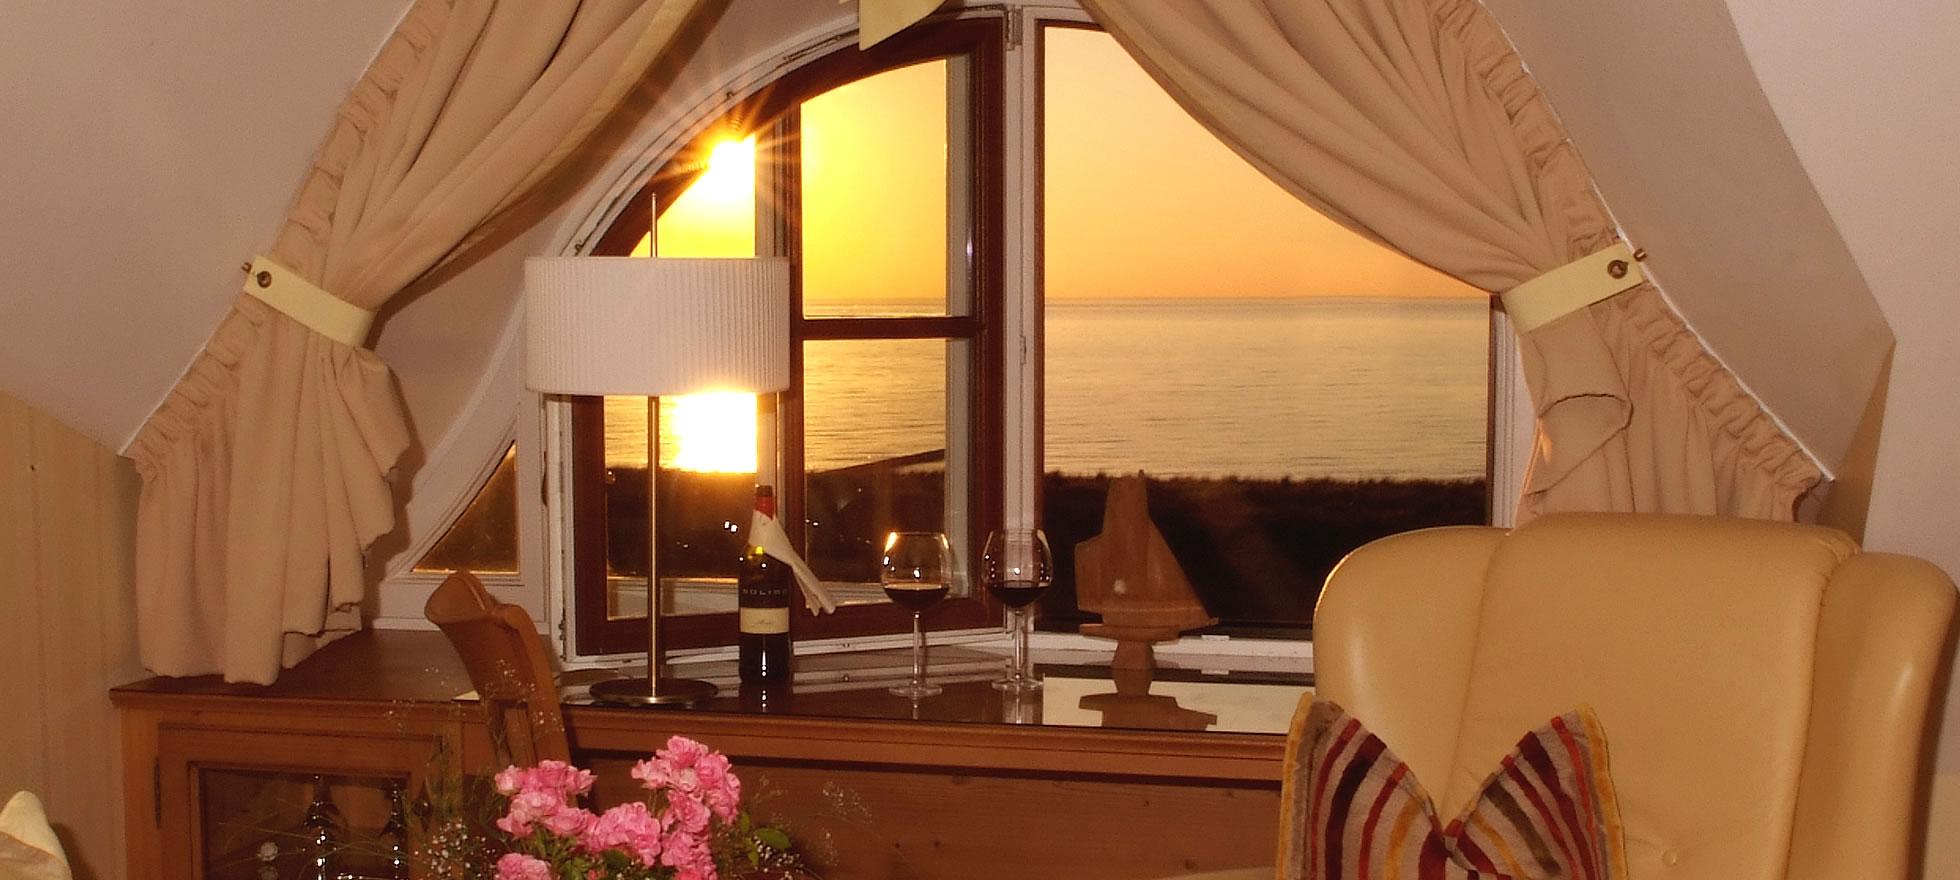 Hotel Namenlos, Suite mit Meerblick